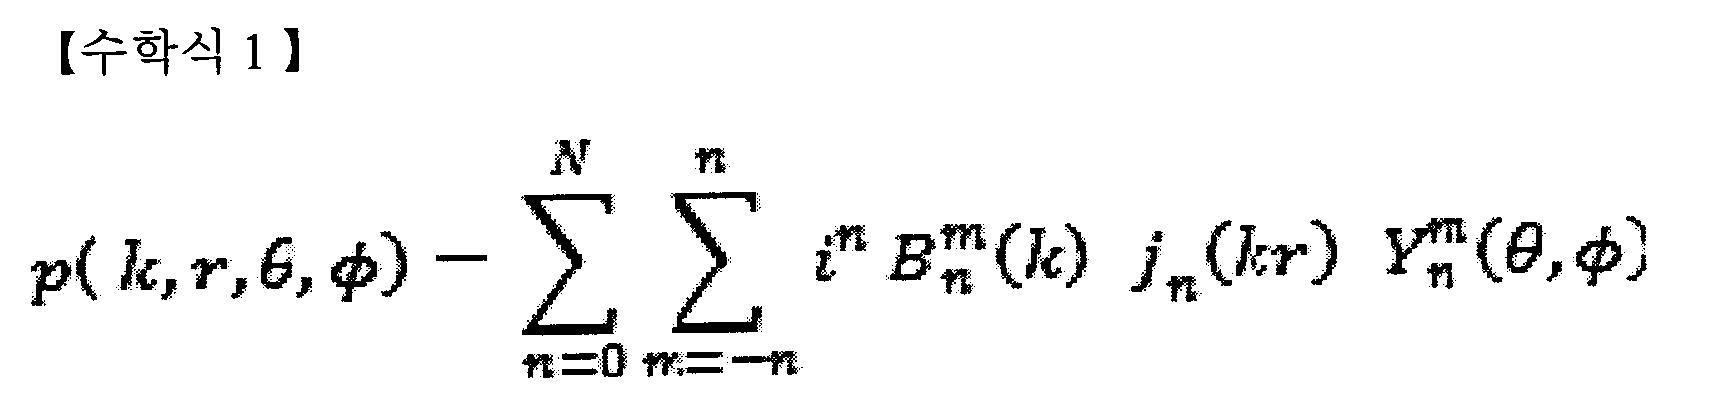 Figure PCTKR2014000443-appb-I000007